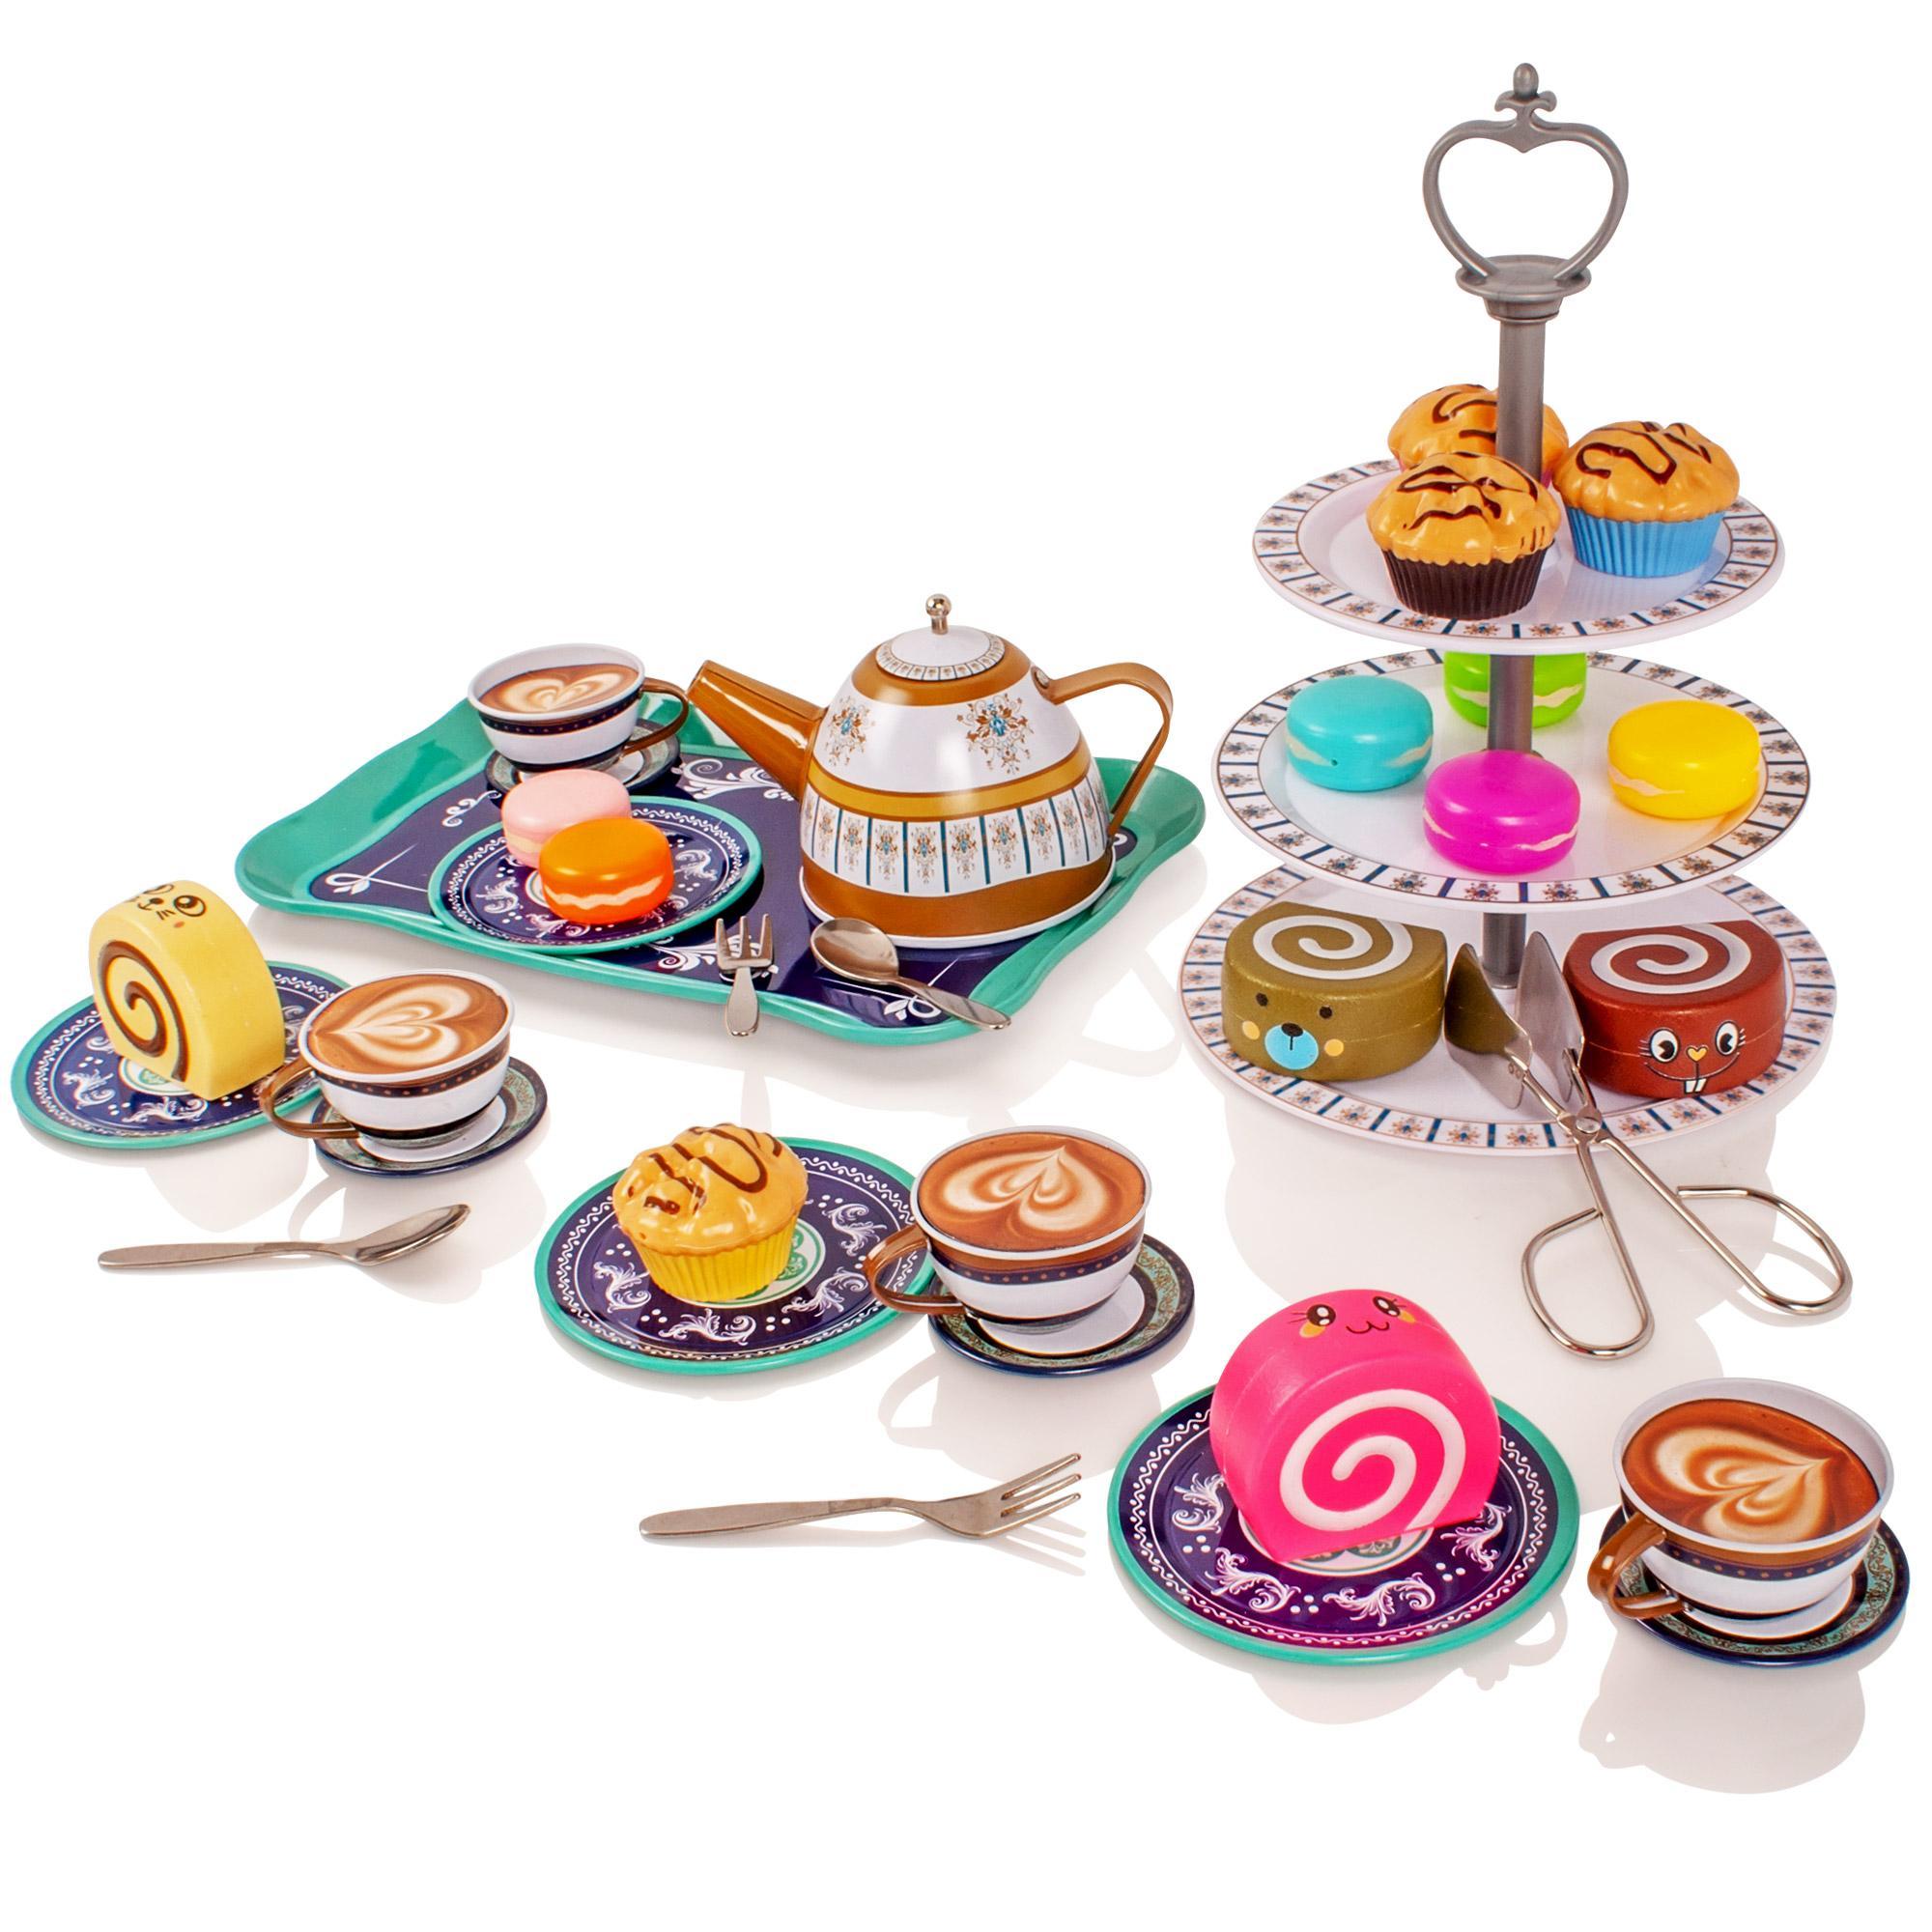 Childrens Kids Metal Tea Set Pretend Play Toy Kitchen Kettle Teapot Cups Saucers Ebay